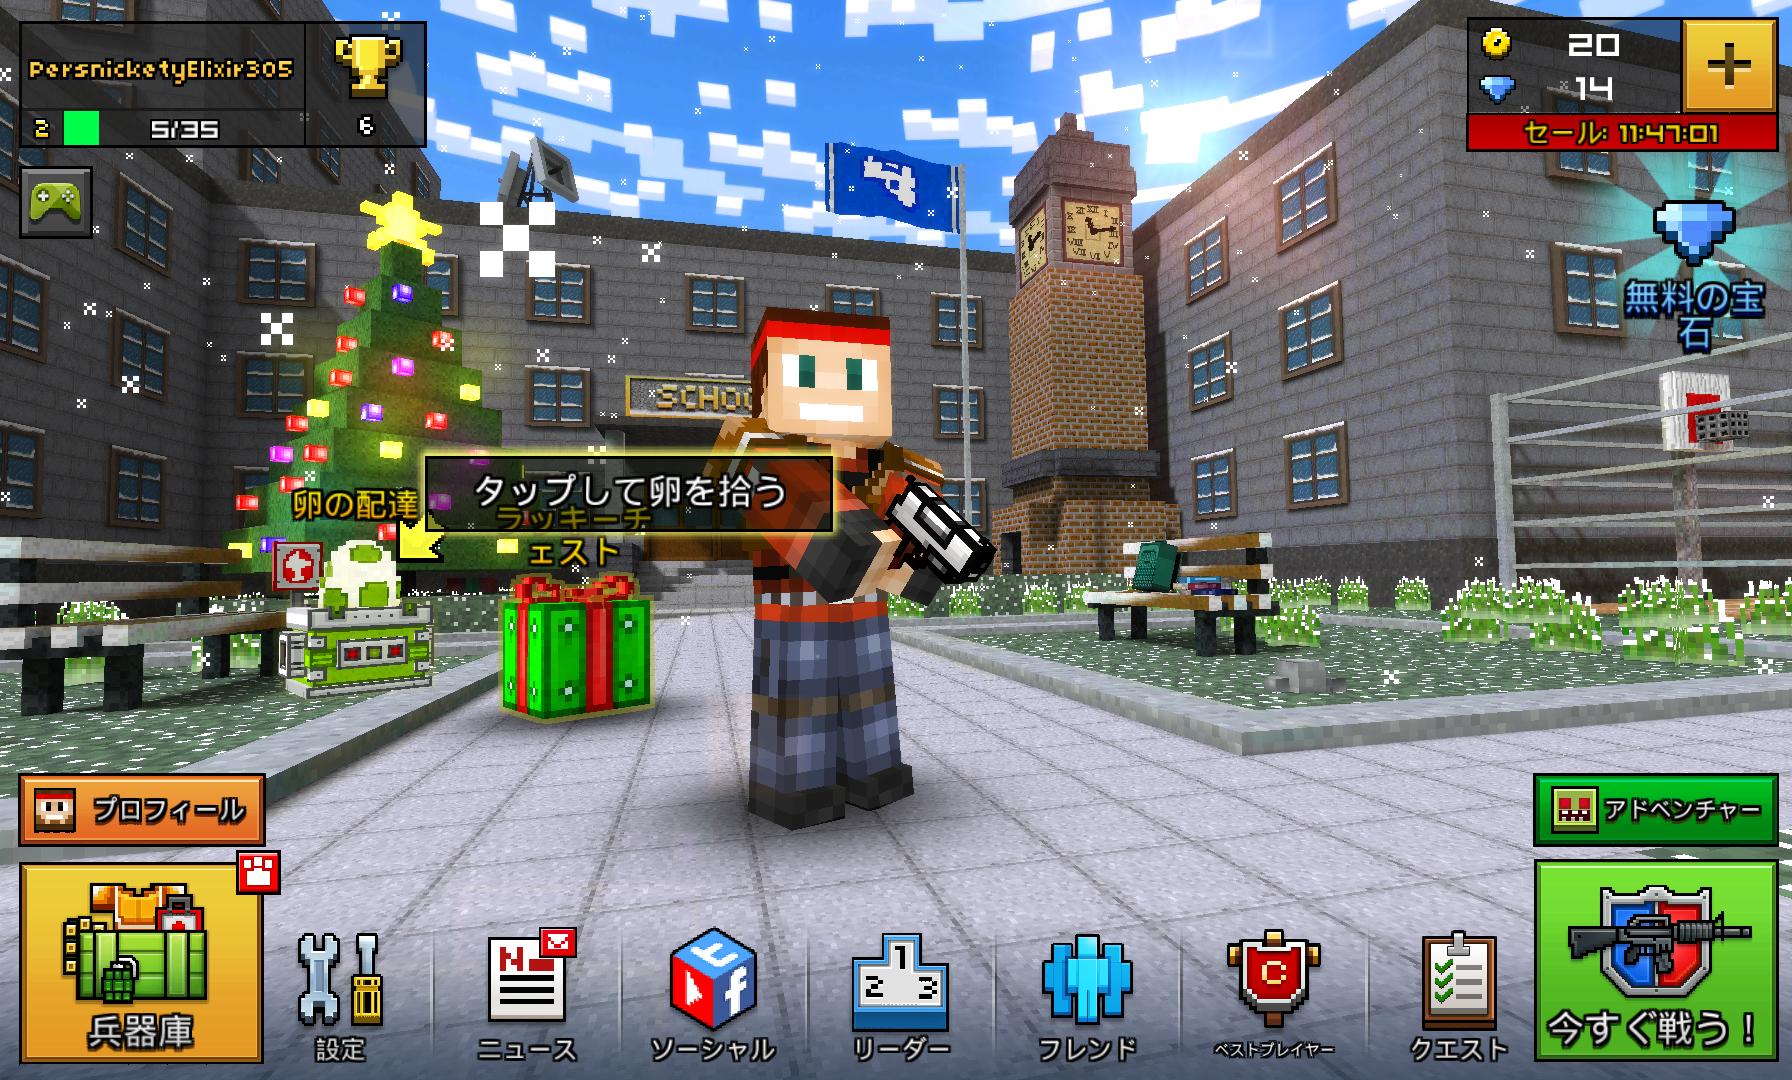 androidアプリ Pixel Gun 3D攻略スクリーンショット1